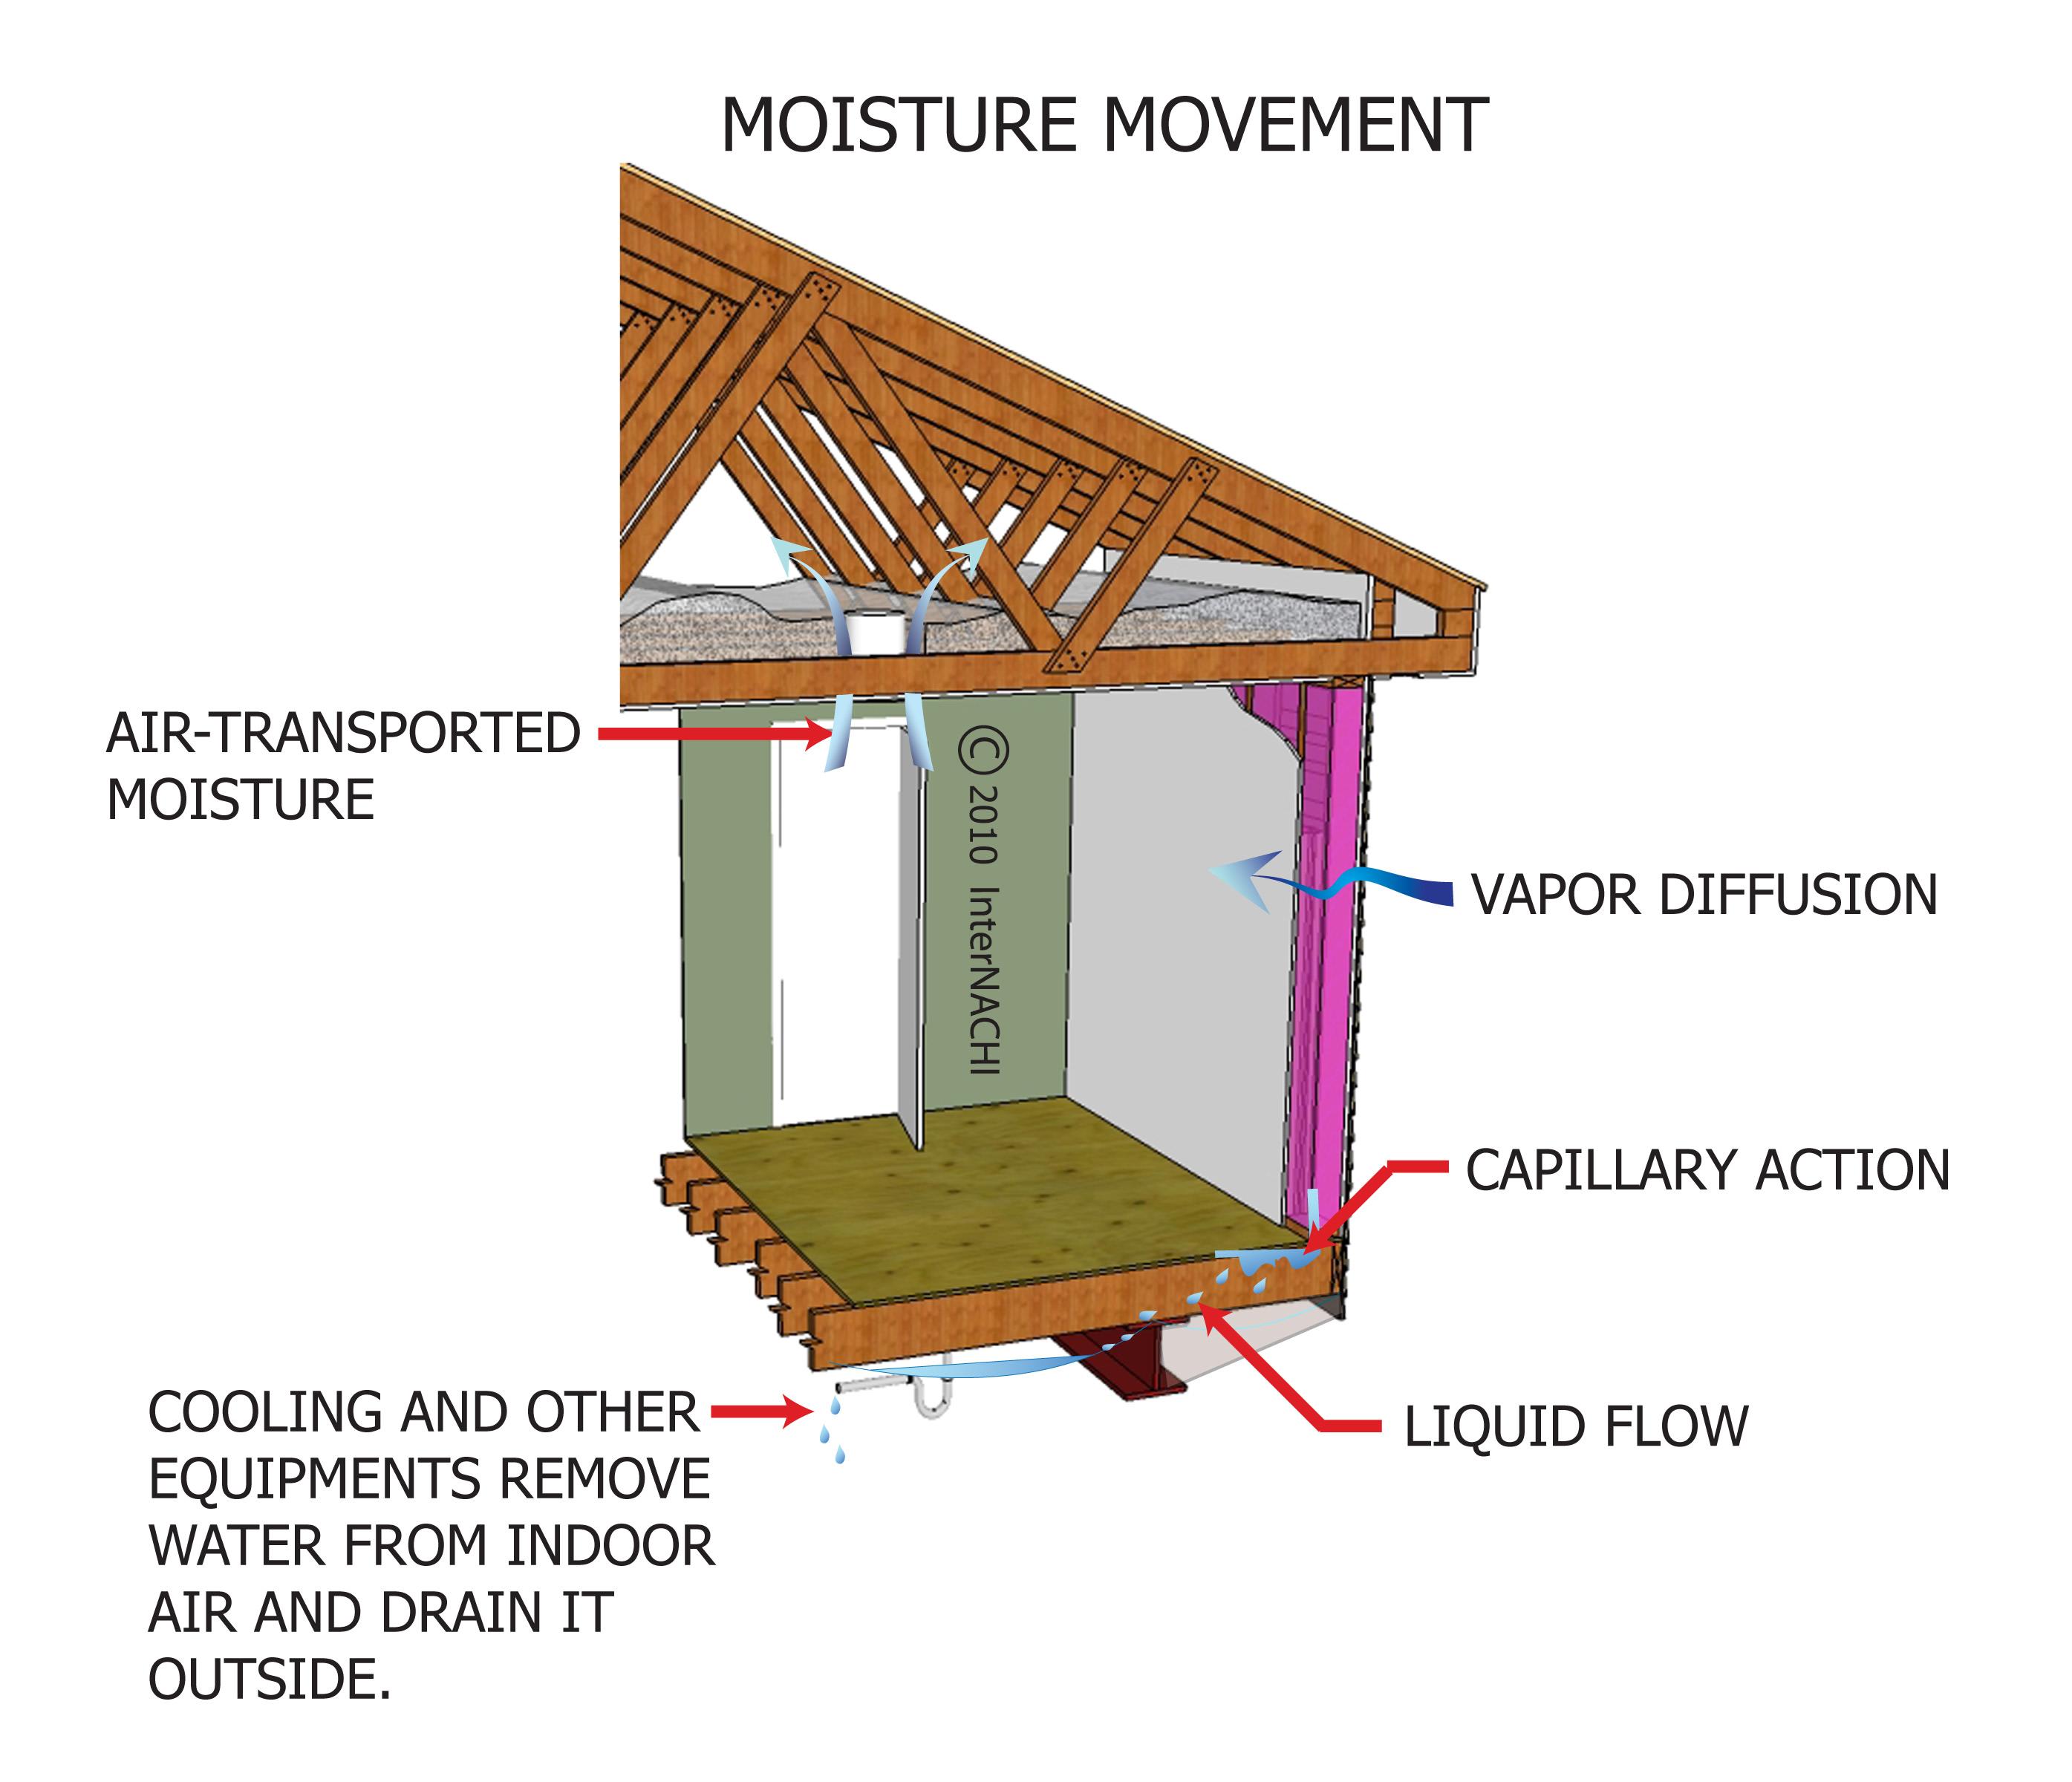 Moisture movement.